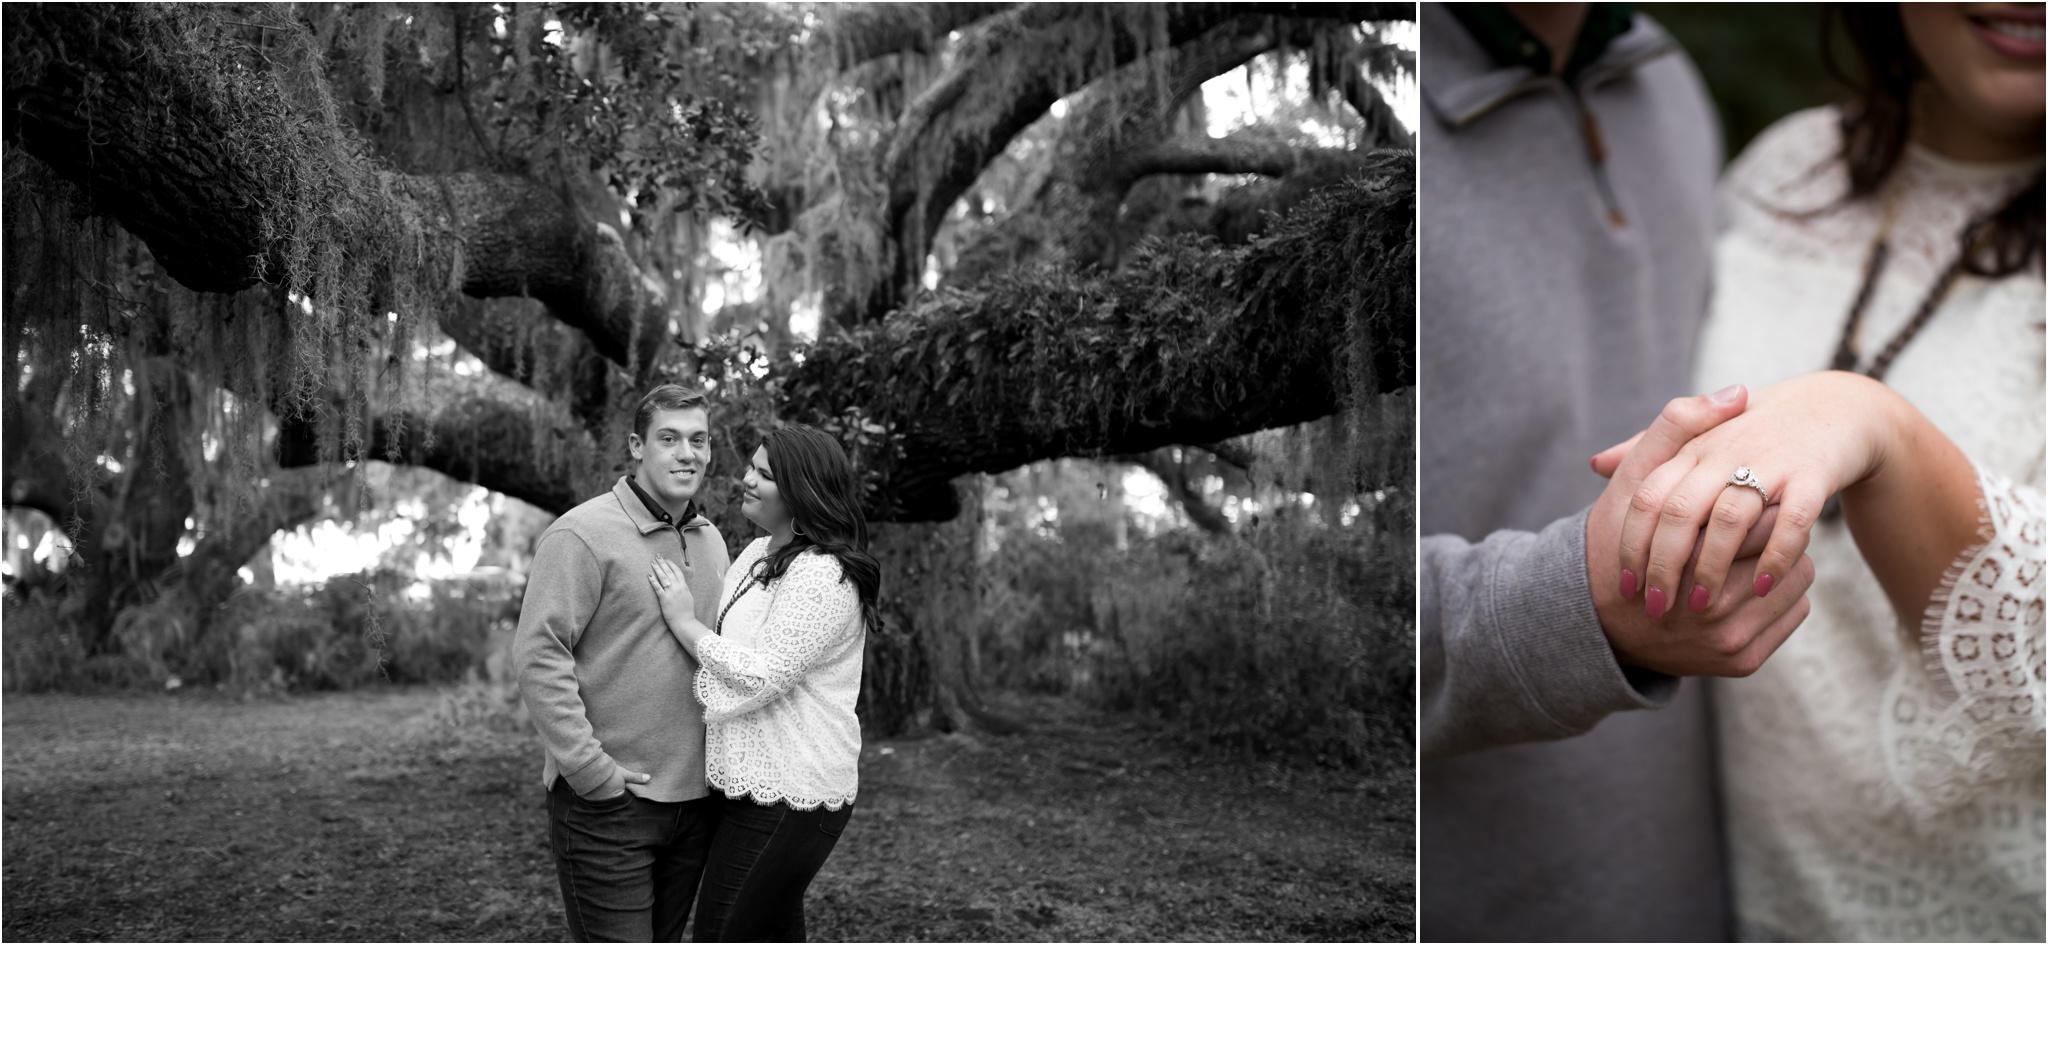 Rainey_Gregg_Photography_St._Simons_Island_Georgia_California_Wedding_Portrait_Photography_0581.jpg